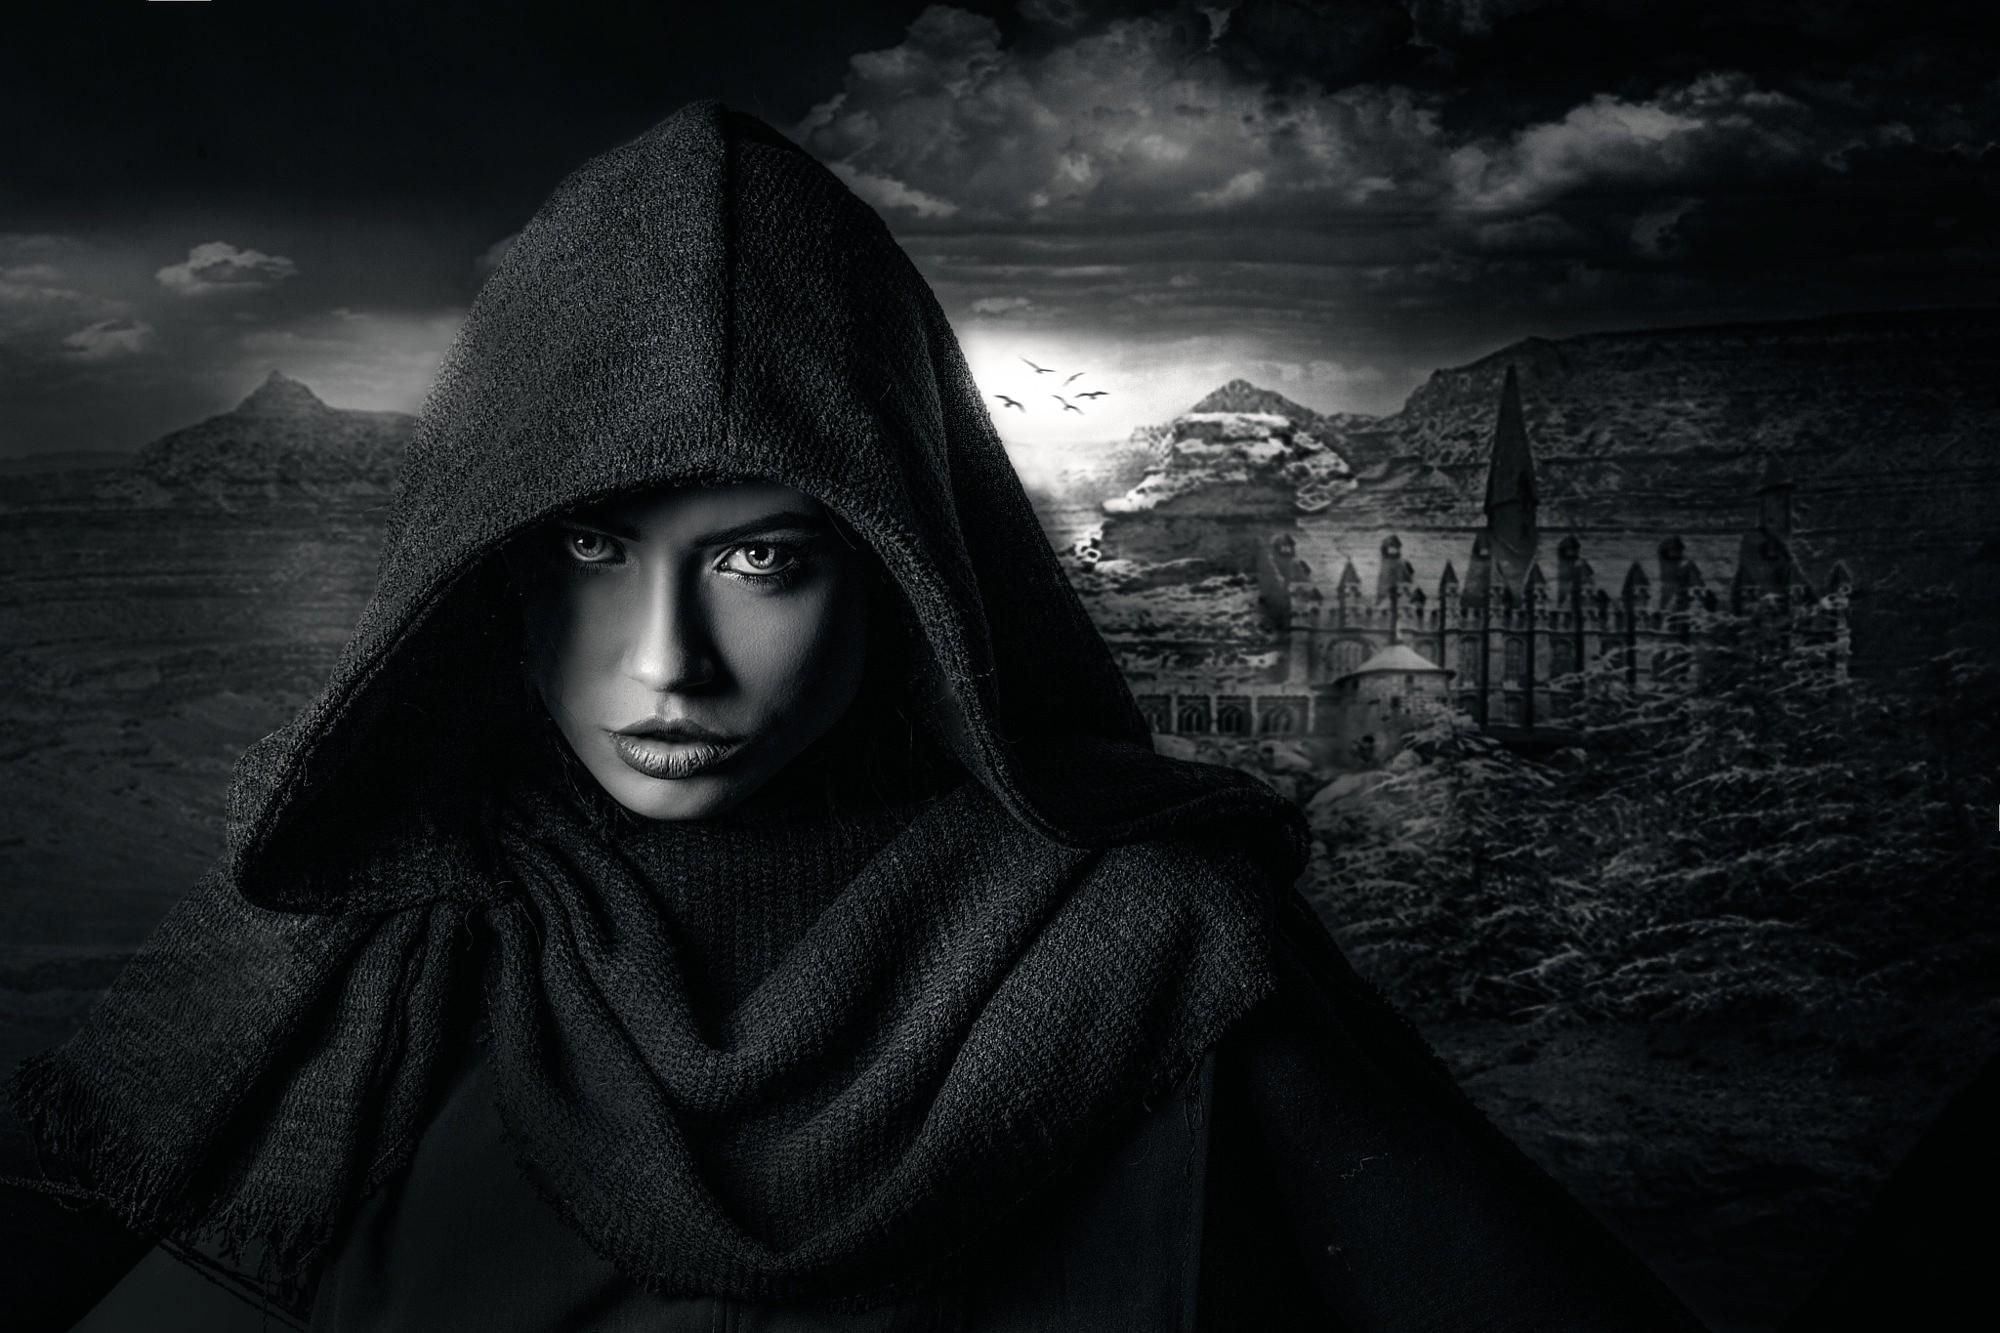 Wallpaper face women model fantasy art looking at viewer cape